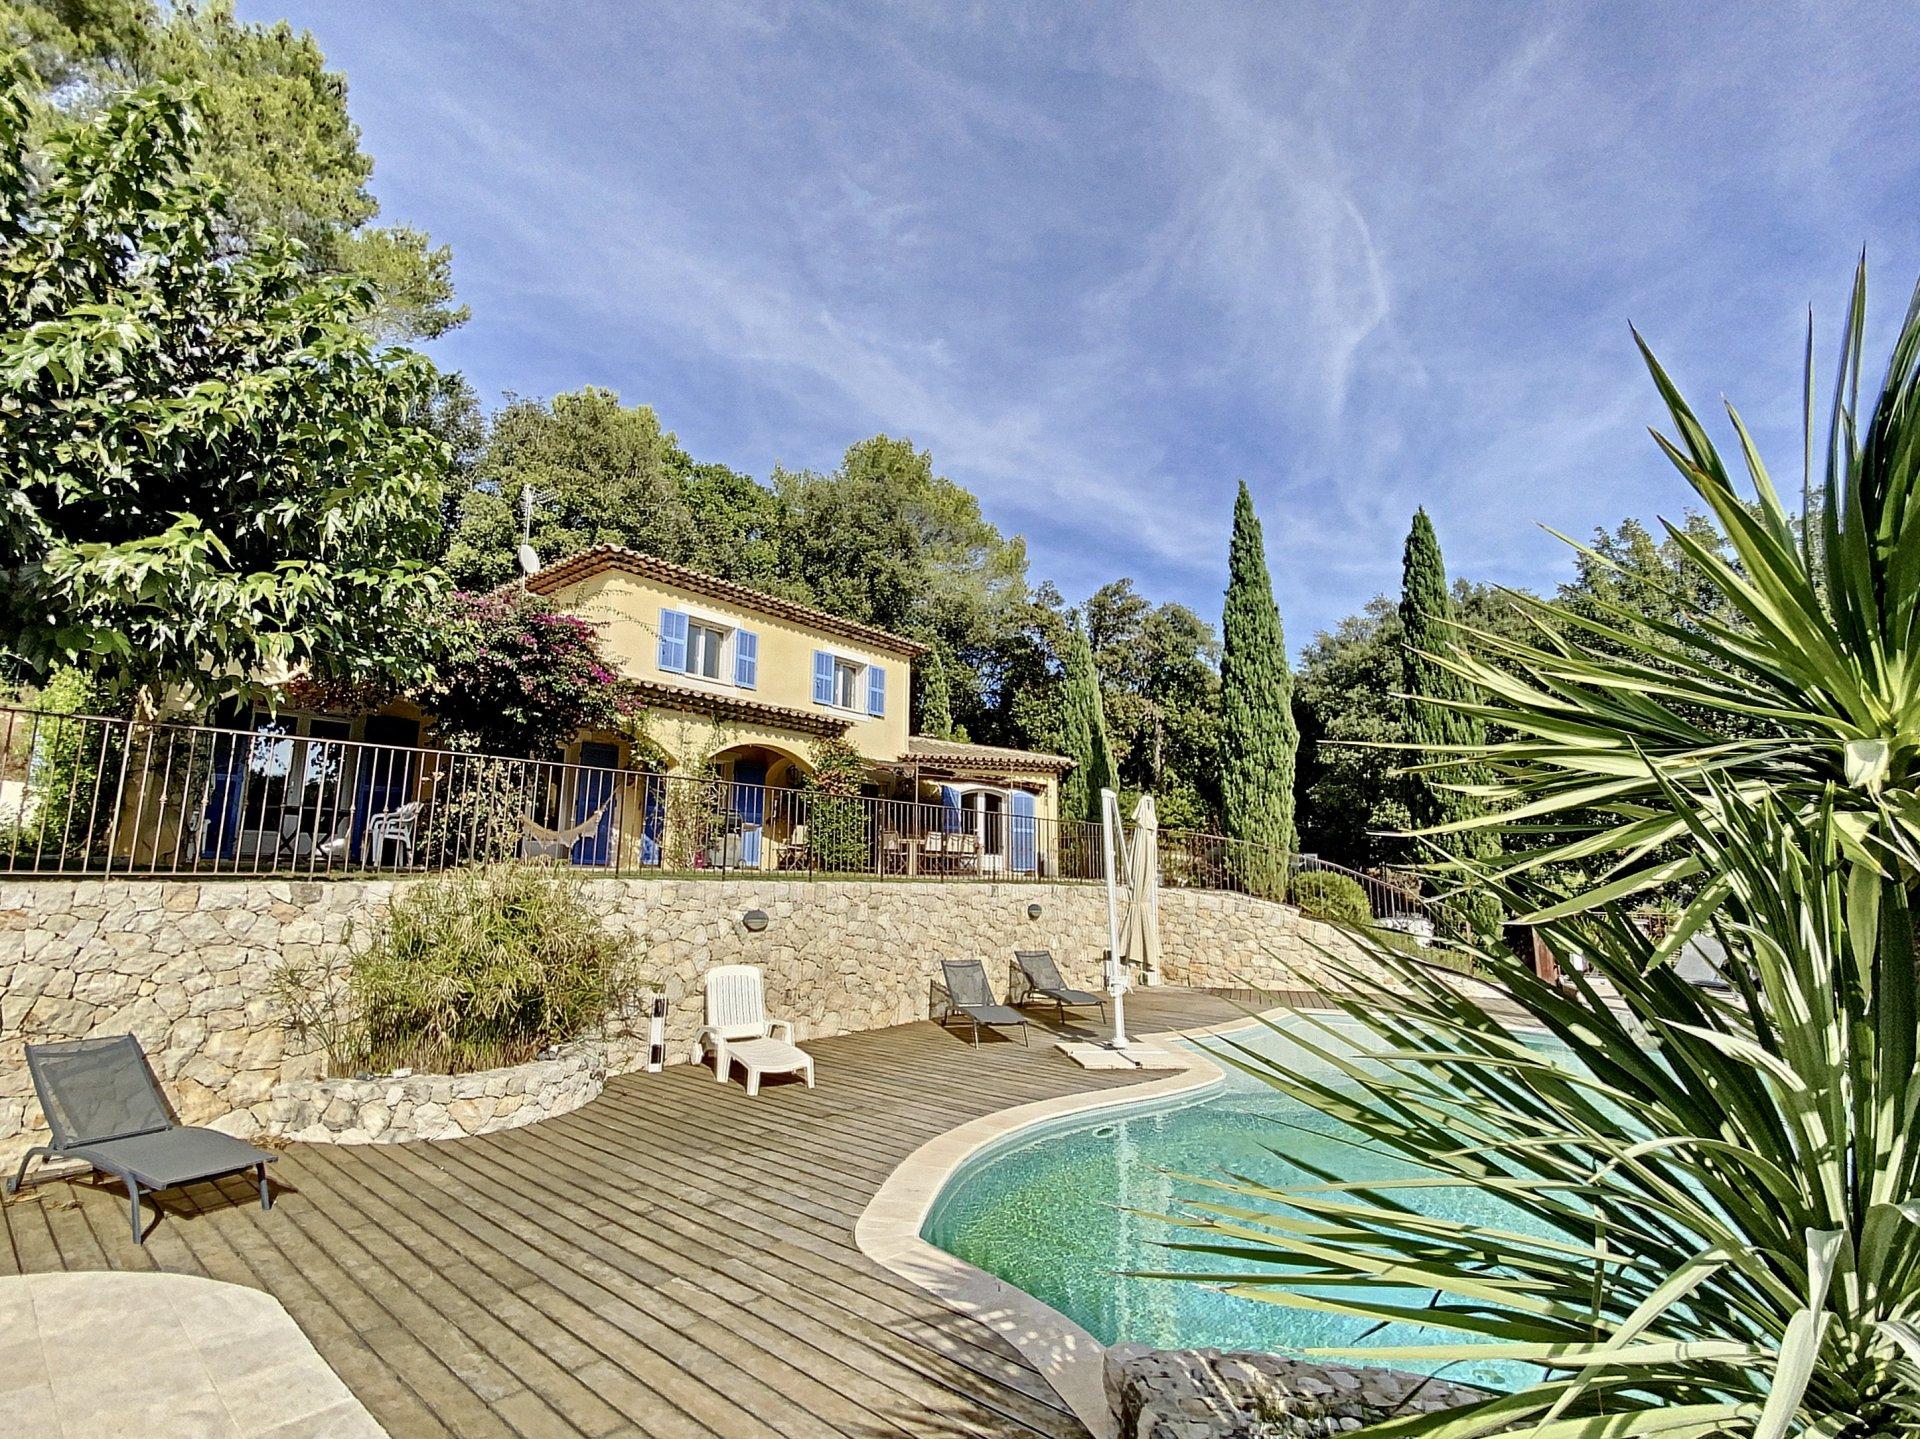 Grasse St Jacques, Villa familiale 5 Ch au calme absolu